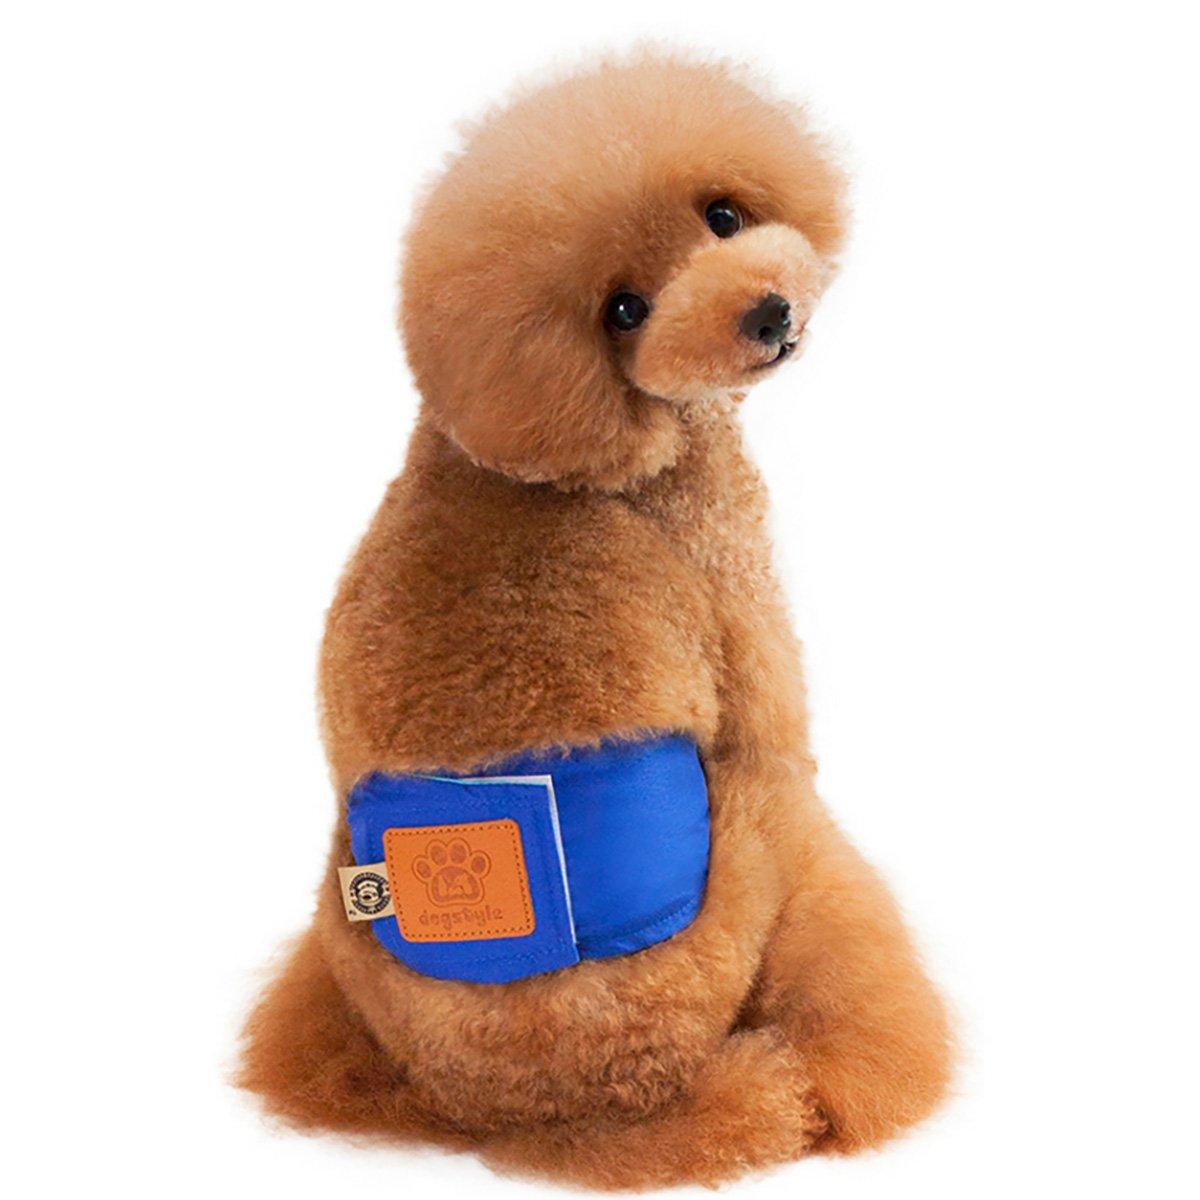 UHeng 4 PCS Male Dog Reusable Wrap Diaper Washable Puppy Belly Band by UHeng (Image #2)